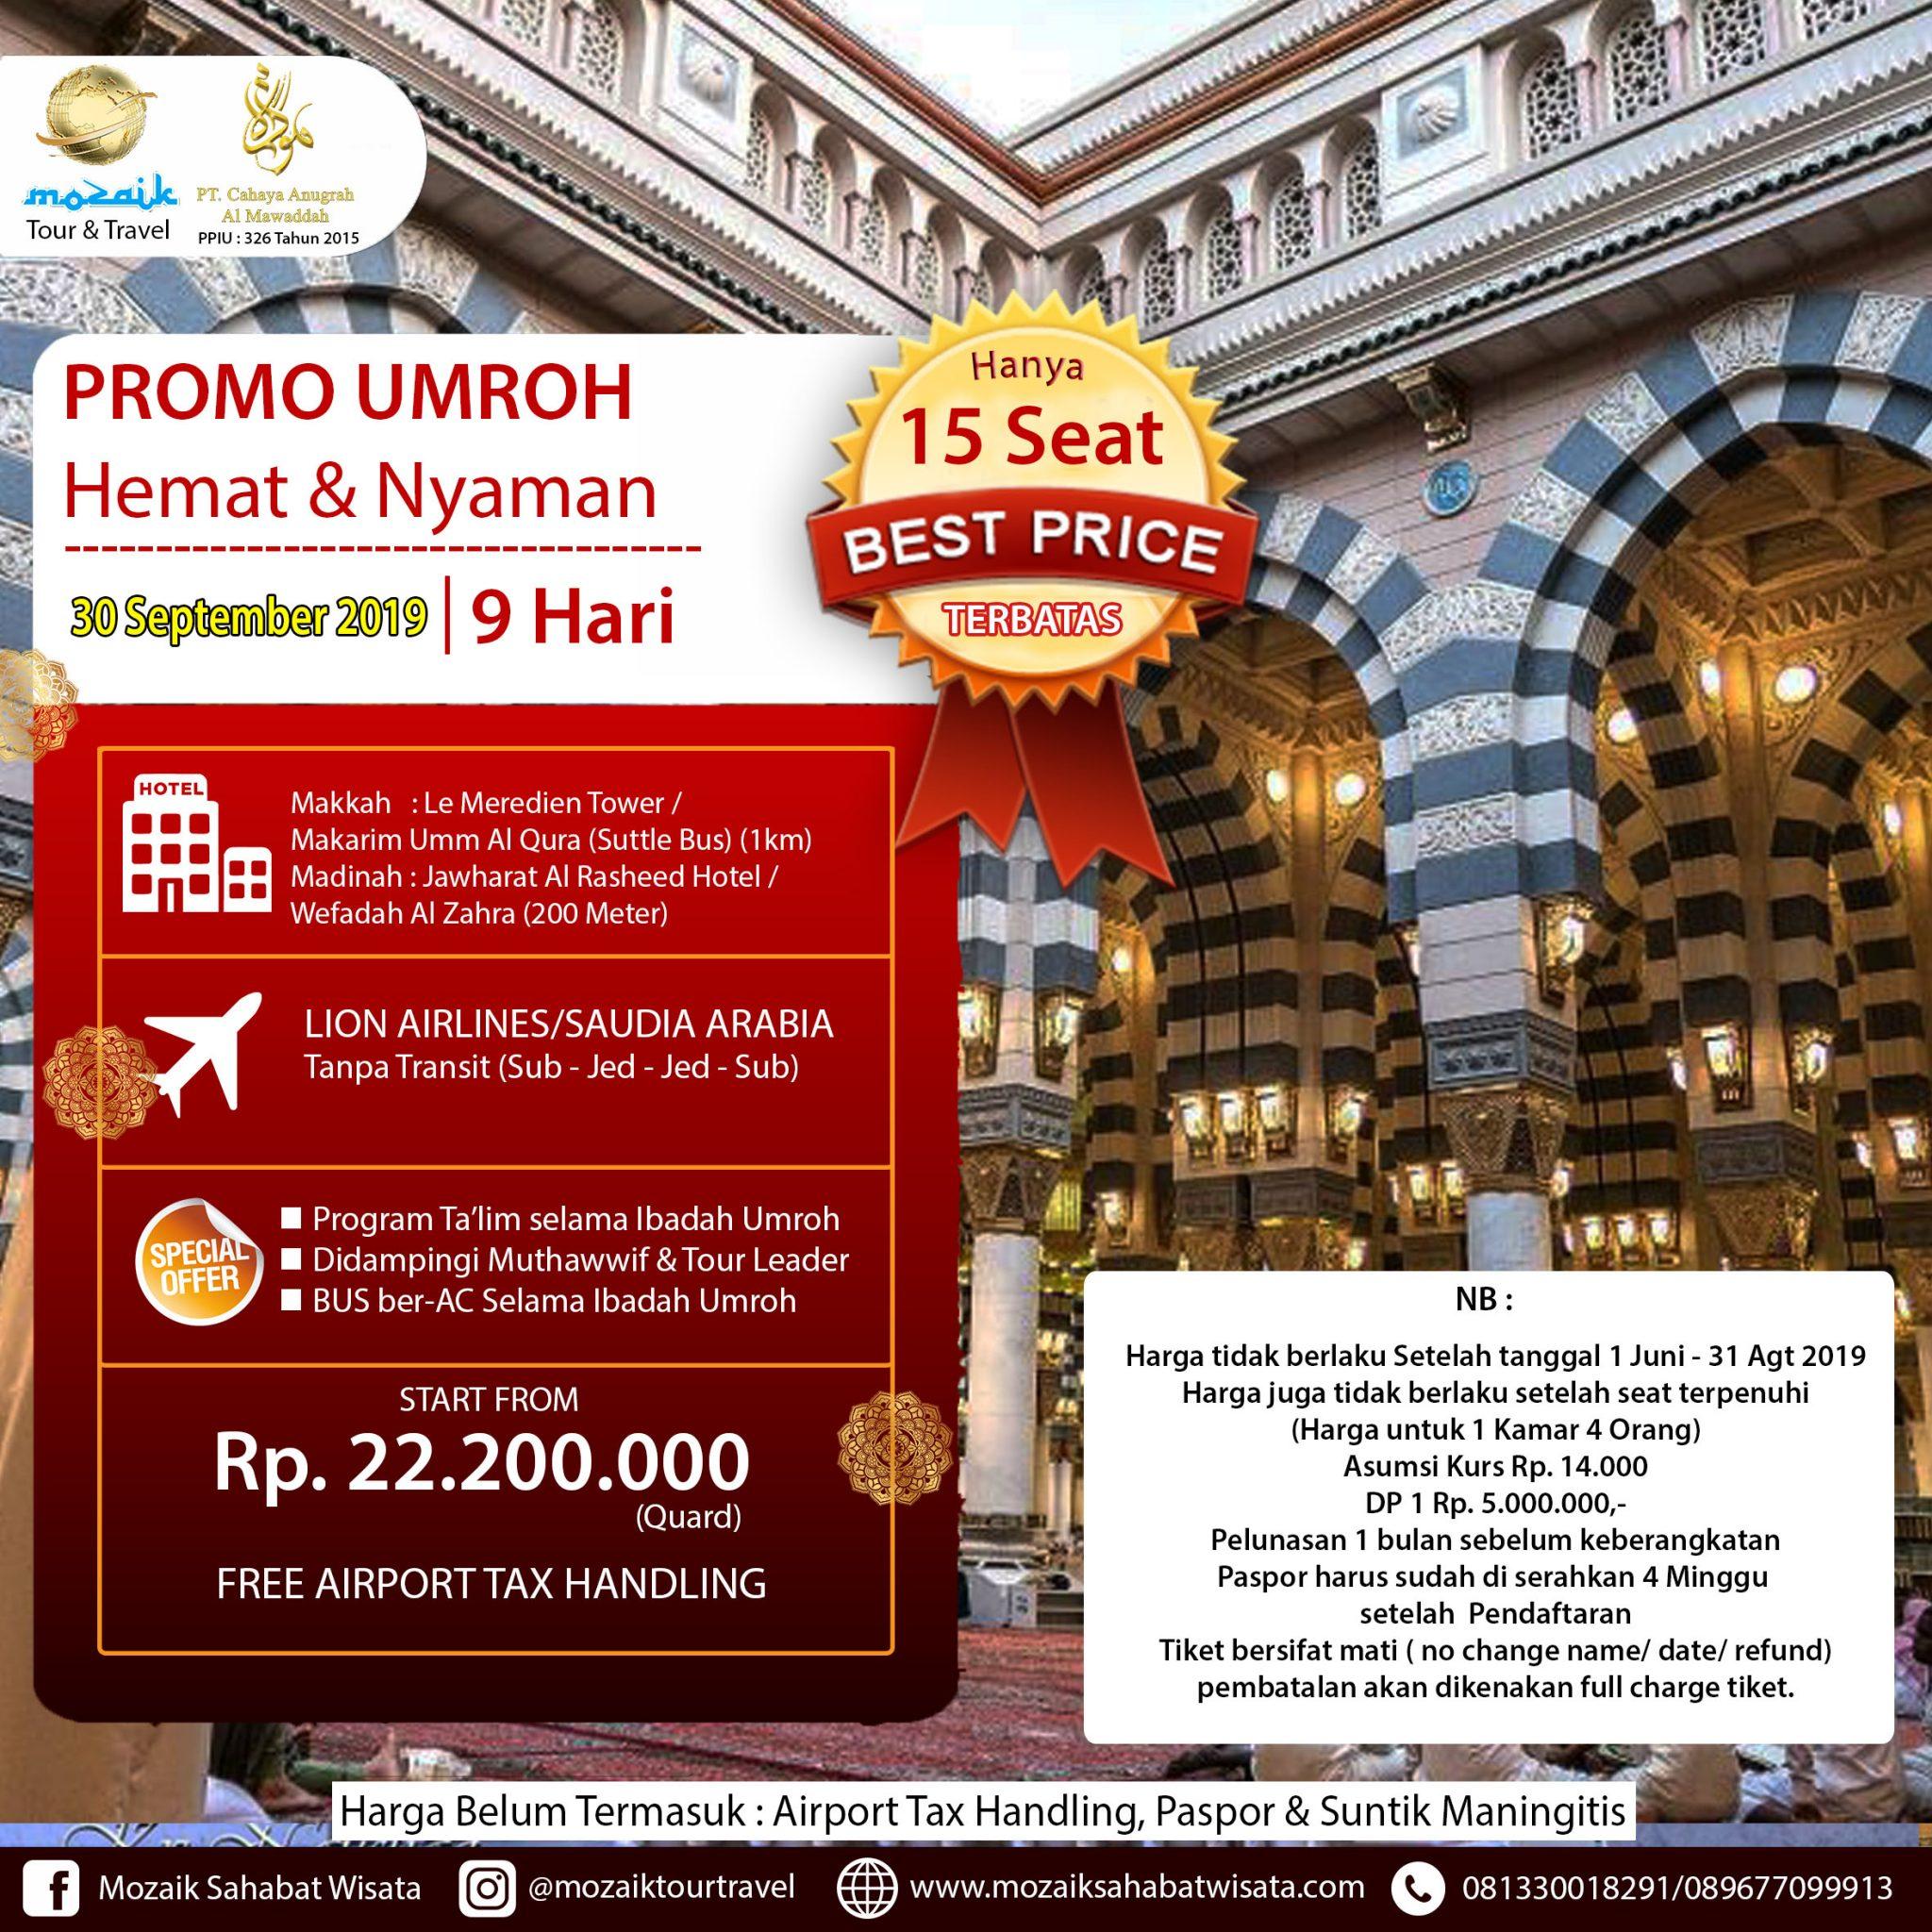 Paket Awal Umroh 9 Hari 30 September 2019  8d0051a18d